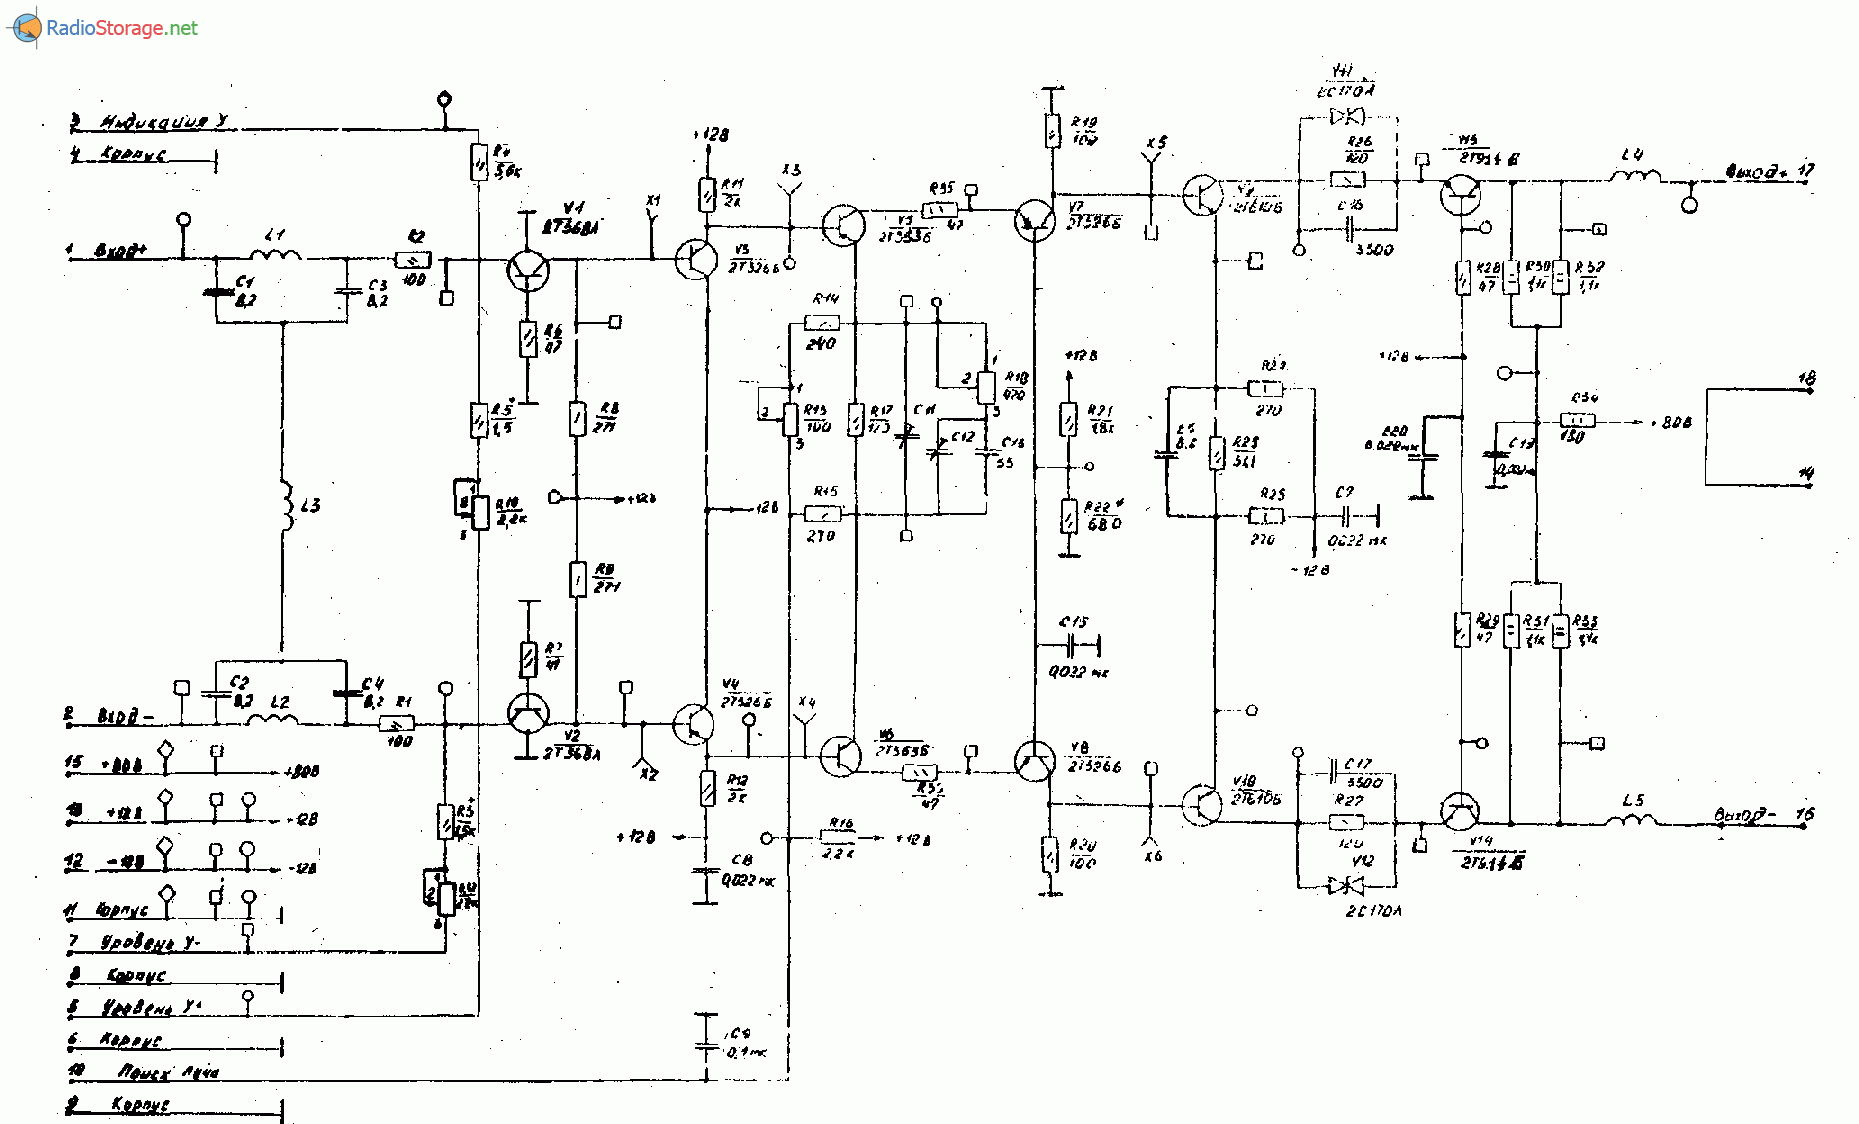 Ремонт осциллографа с1-94 своими руками 66